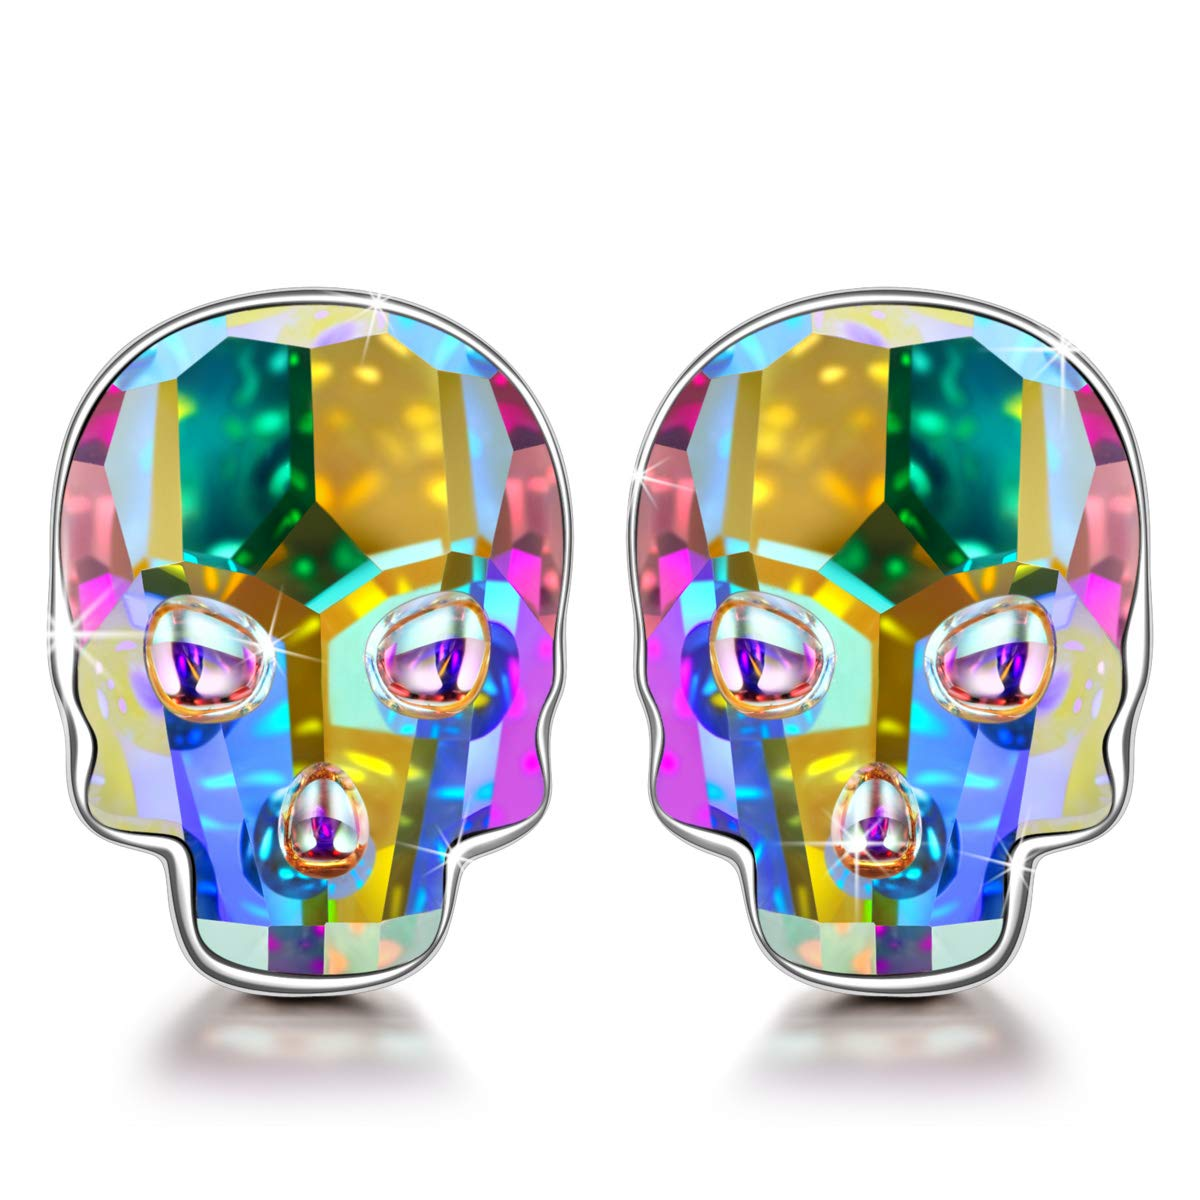 NINASUN Halloween Gifts Earrings for Girls Teens Kids 925 Sterling Silver Skull Head Stud Earrings for Her Aurora Swarovski Crystal Fine Jewelry for Women Halloween Gifts Idea for Sister Best Friends